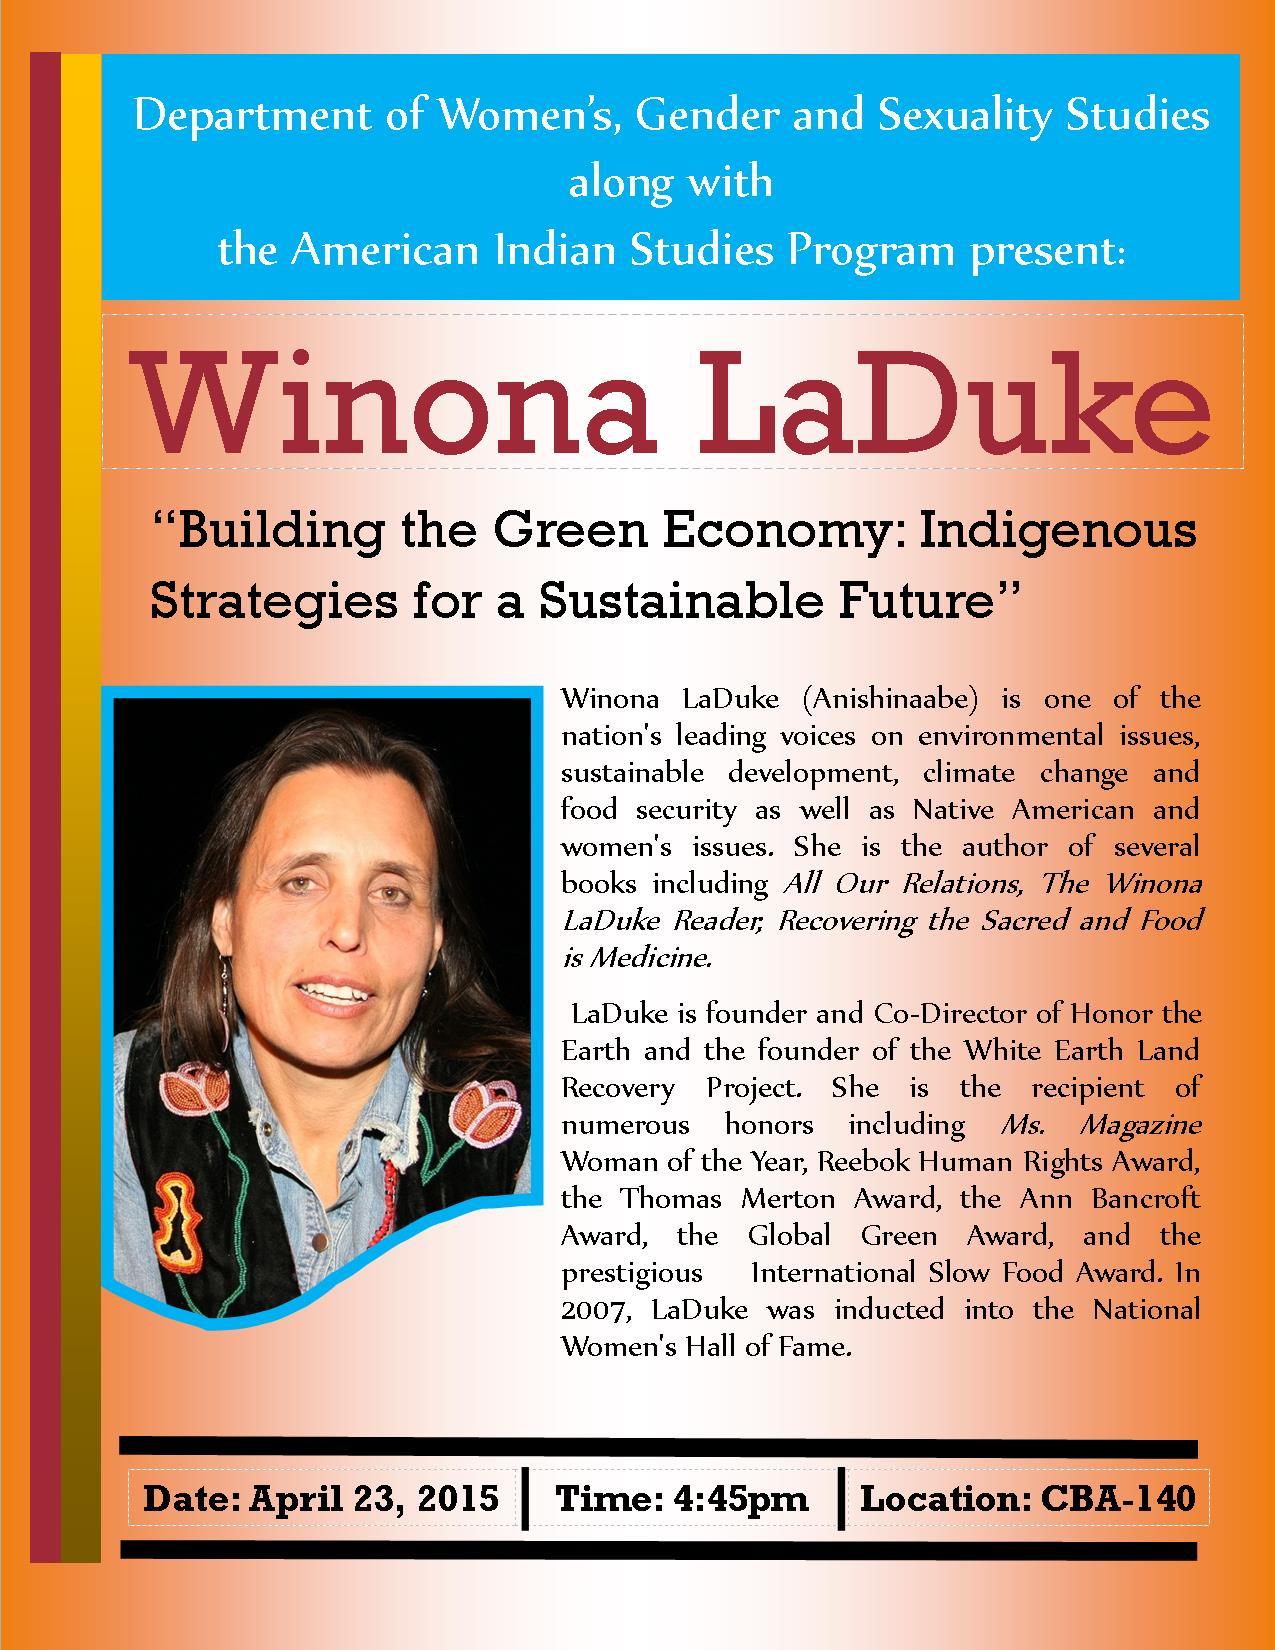 Winona LaDuke Flyer - Revised - 04-06-15